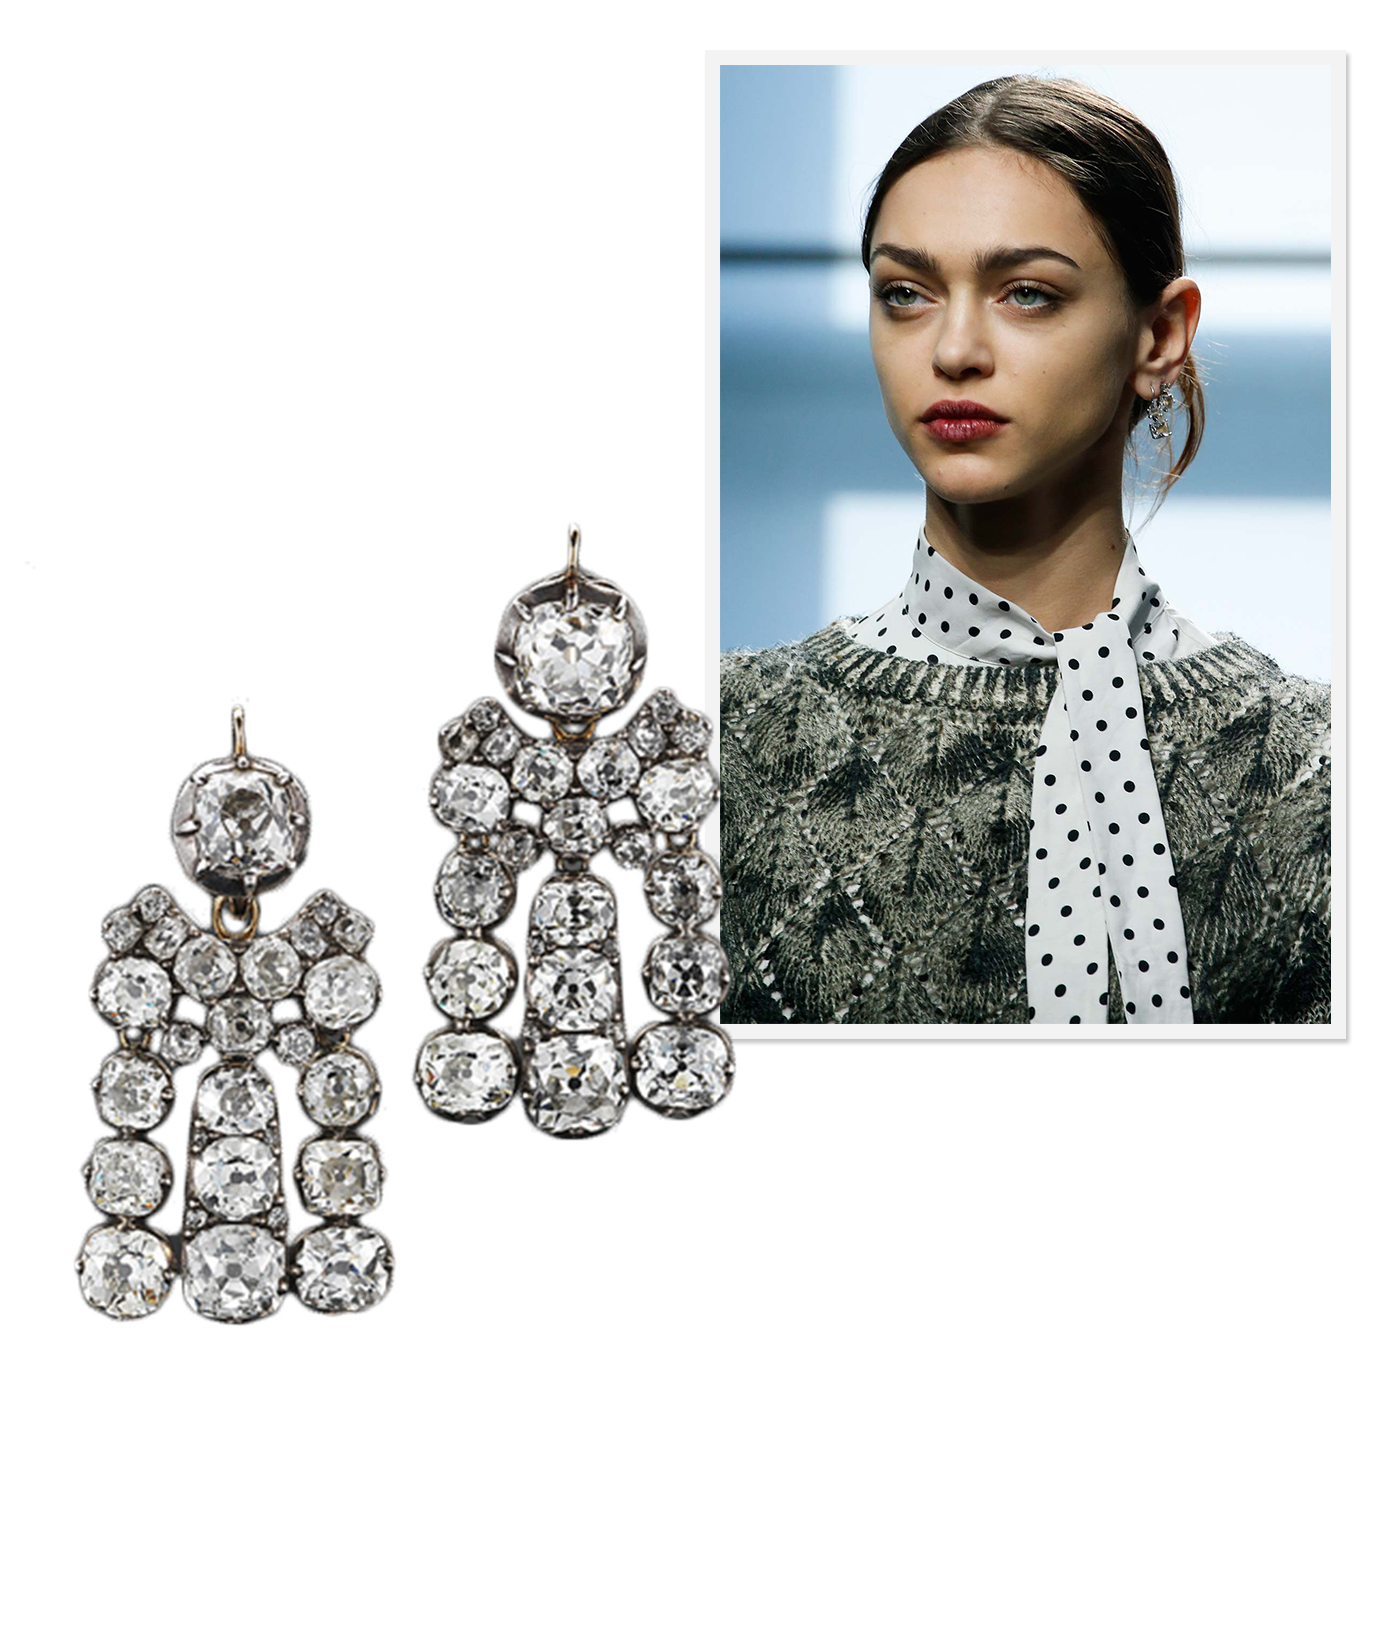 jewelry-trends-fall-2015-runway-10.jpg